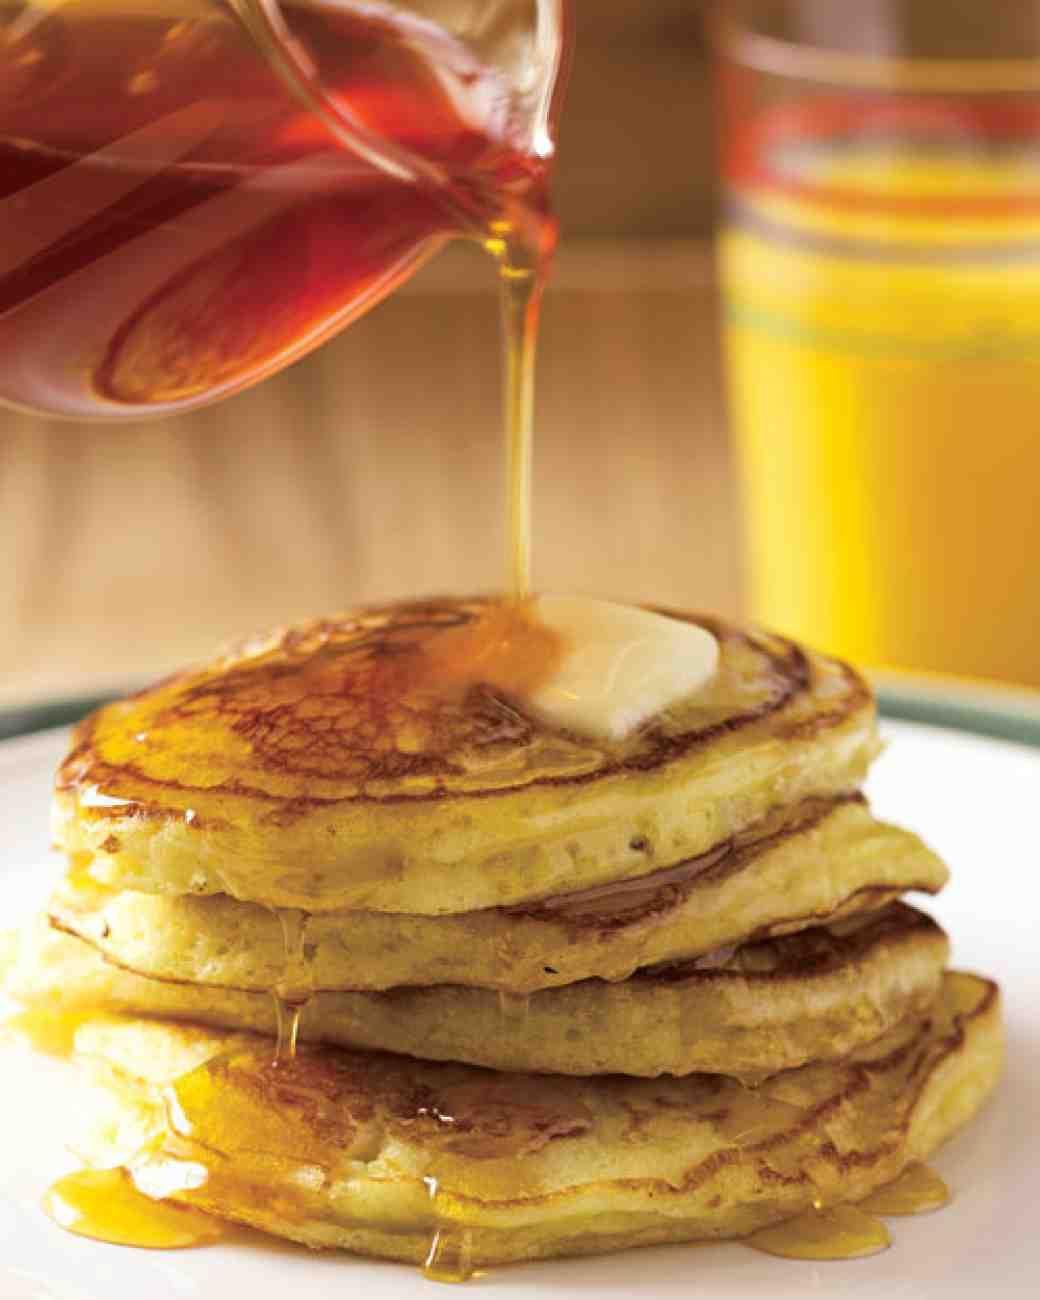 Best Buttermilk Pancakes Recipe Buttermilk Pancakes Pancake Recipe Buttermilk Pancakes